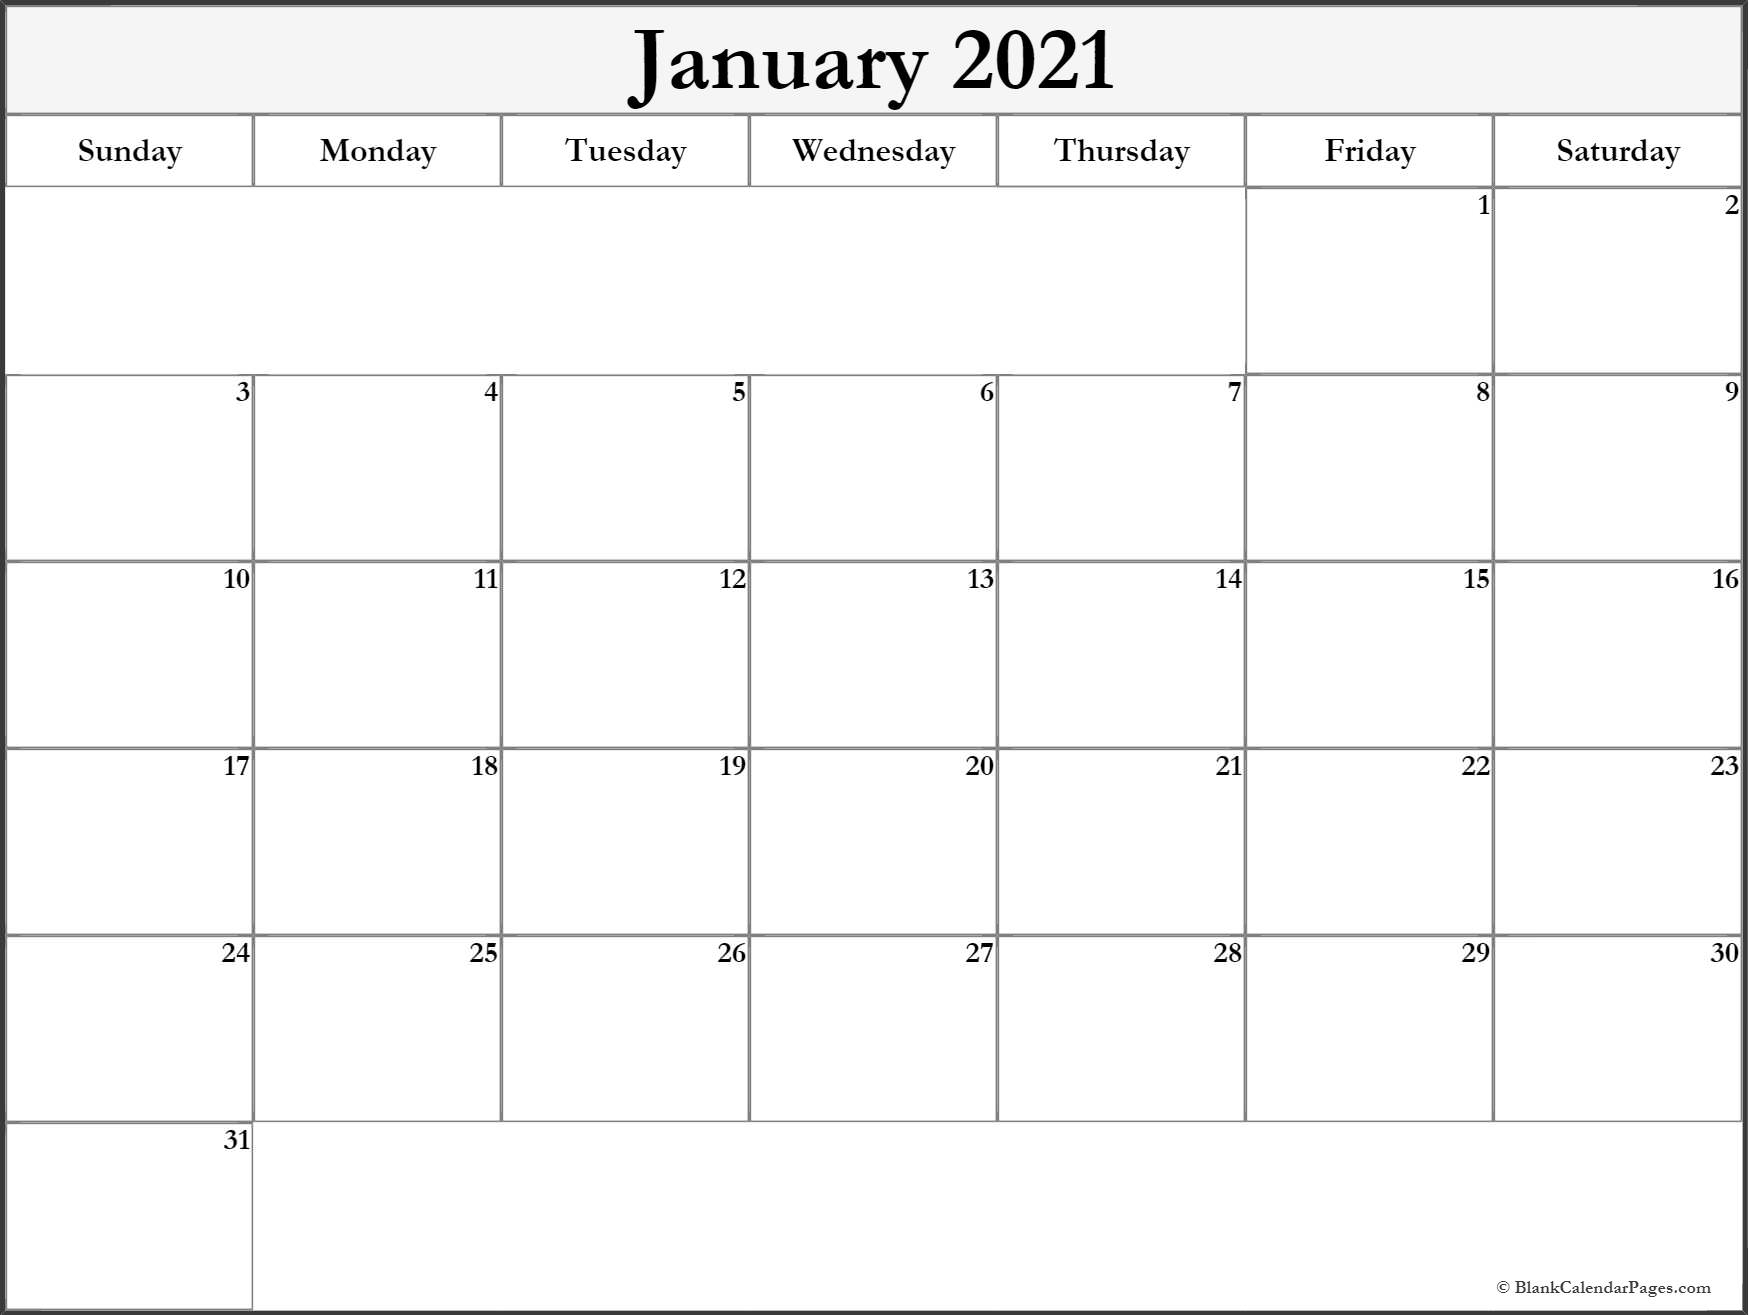 January 2021 Blank Calendar Collection 9